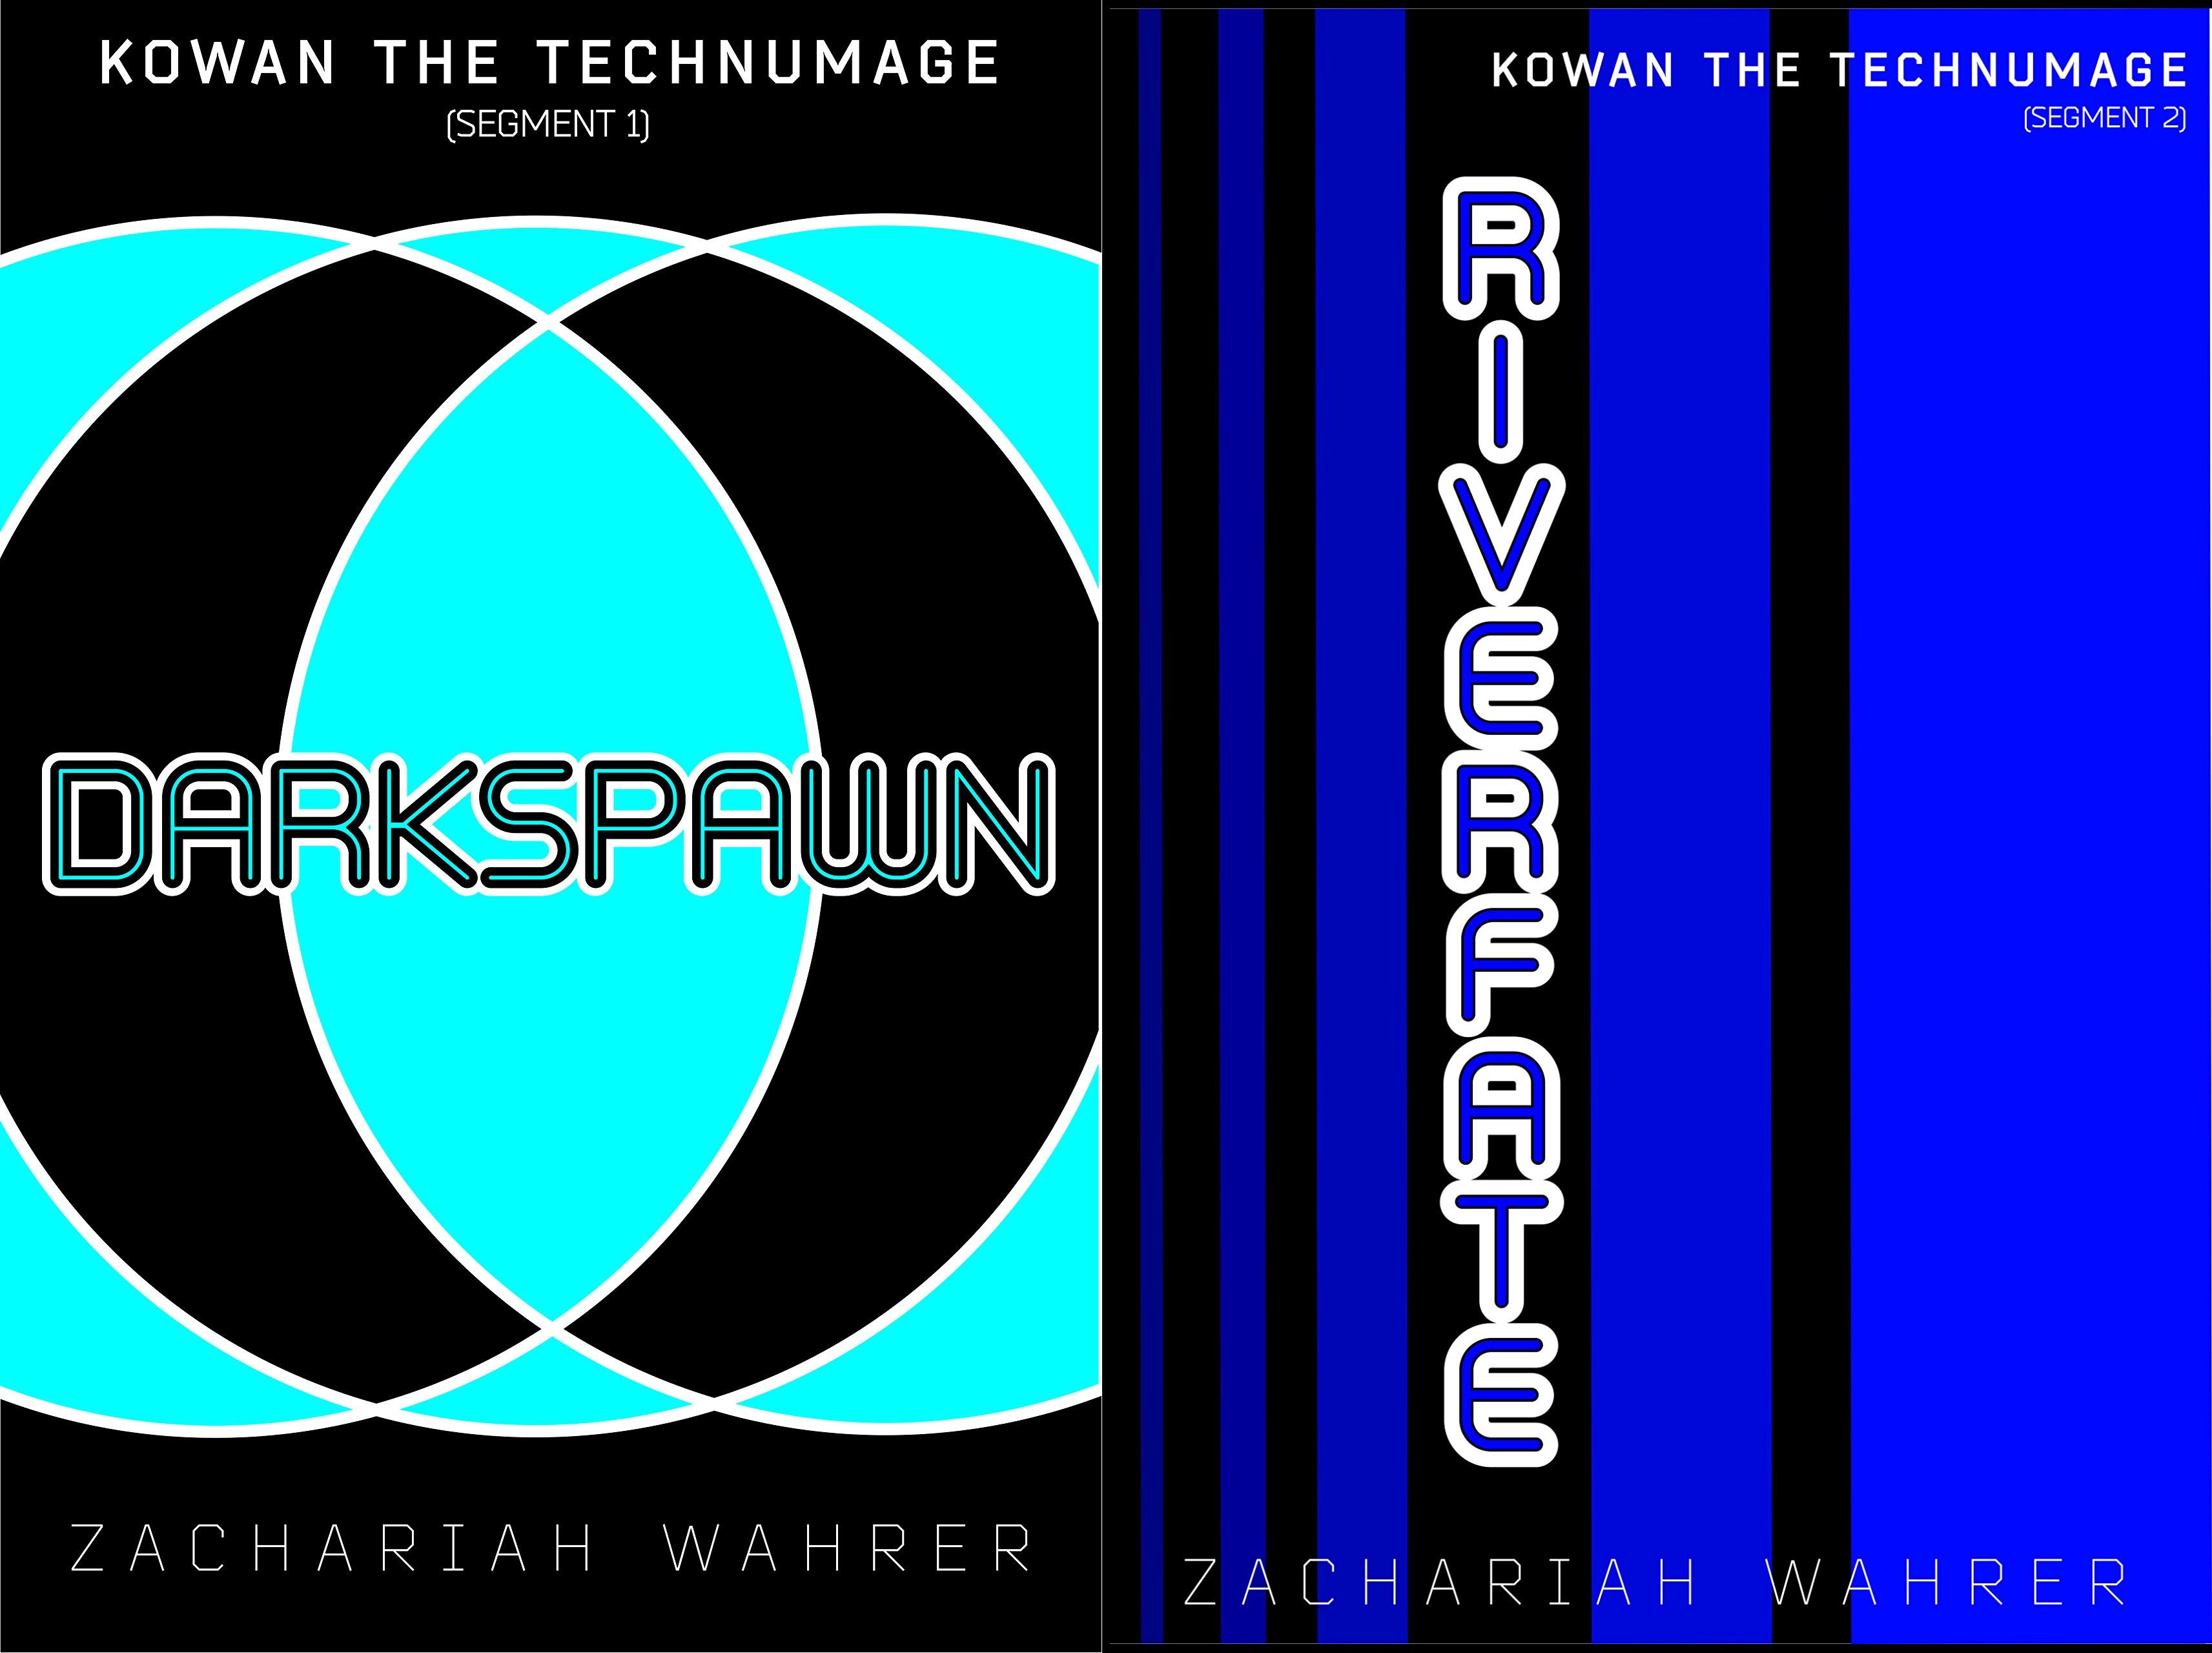 Kowan the Technumage (2 Book Series)